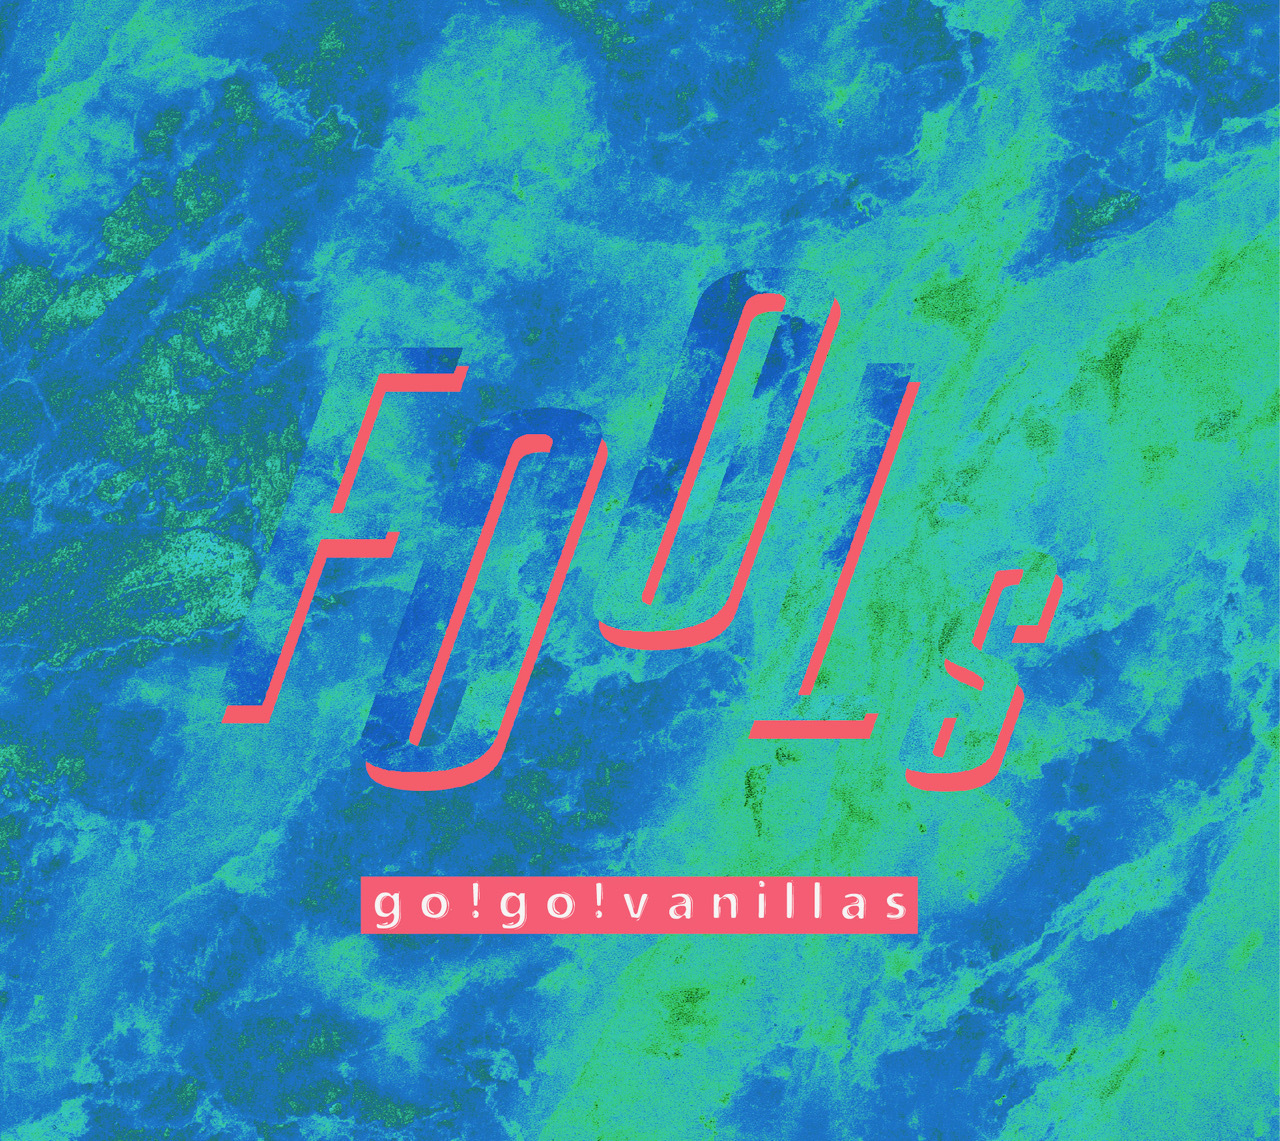 go!go!vanillas アルバム『FOOLs』